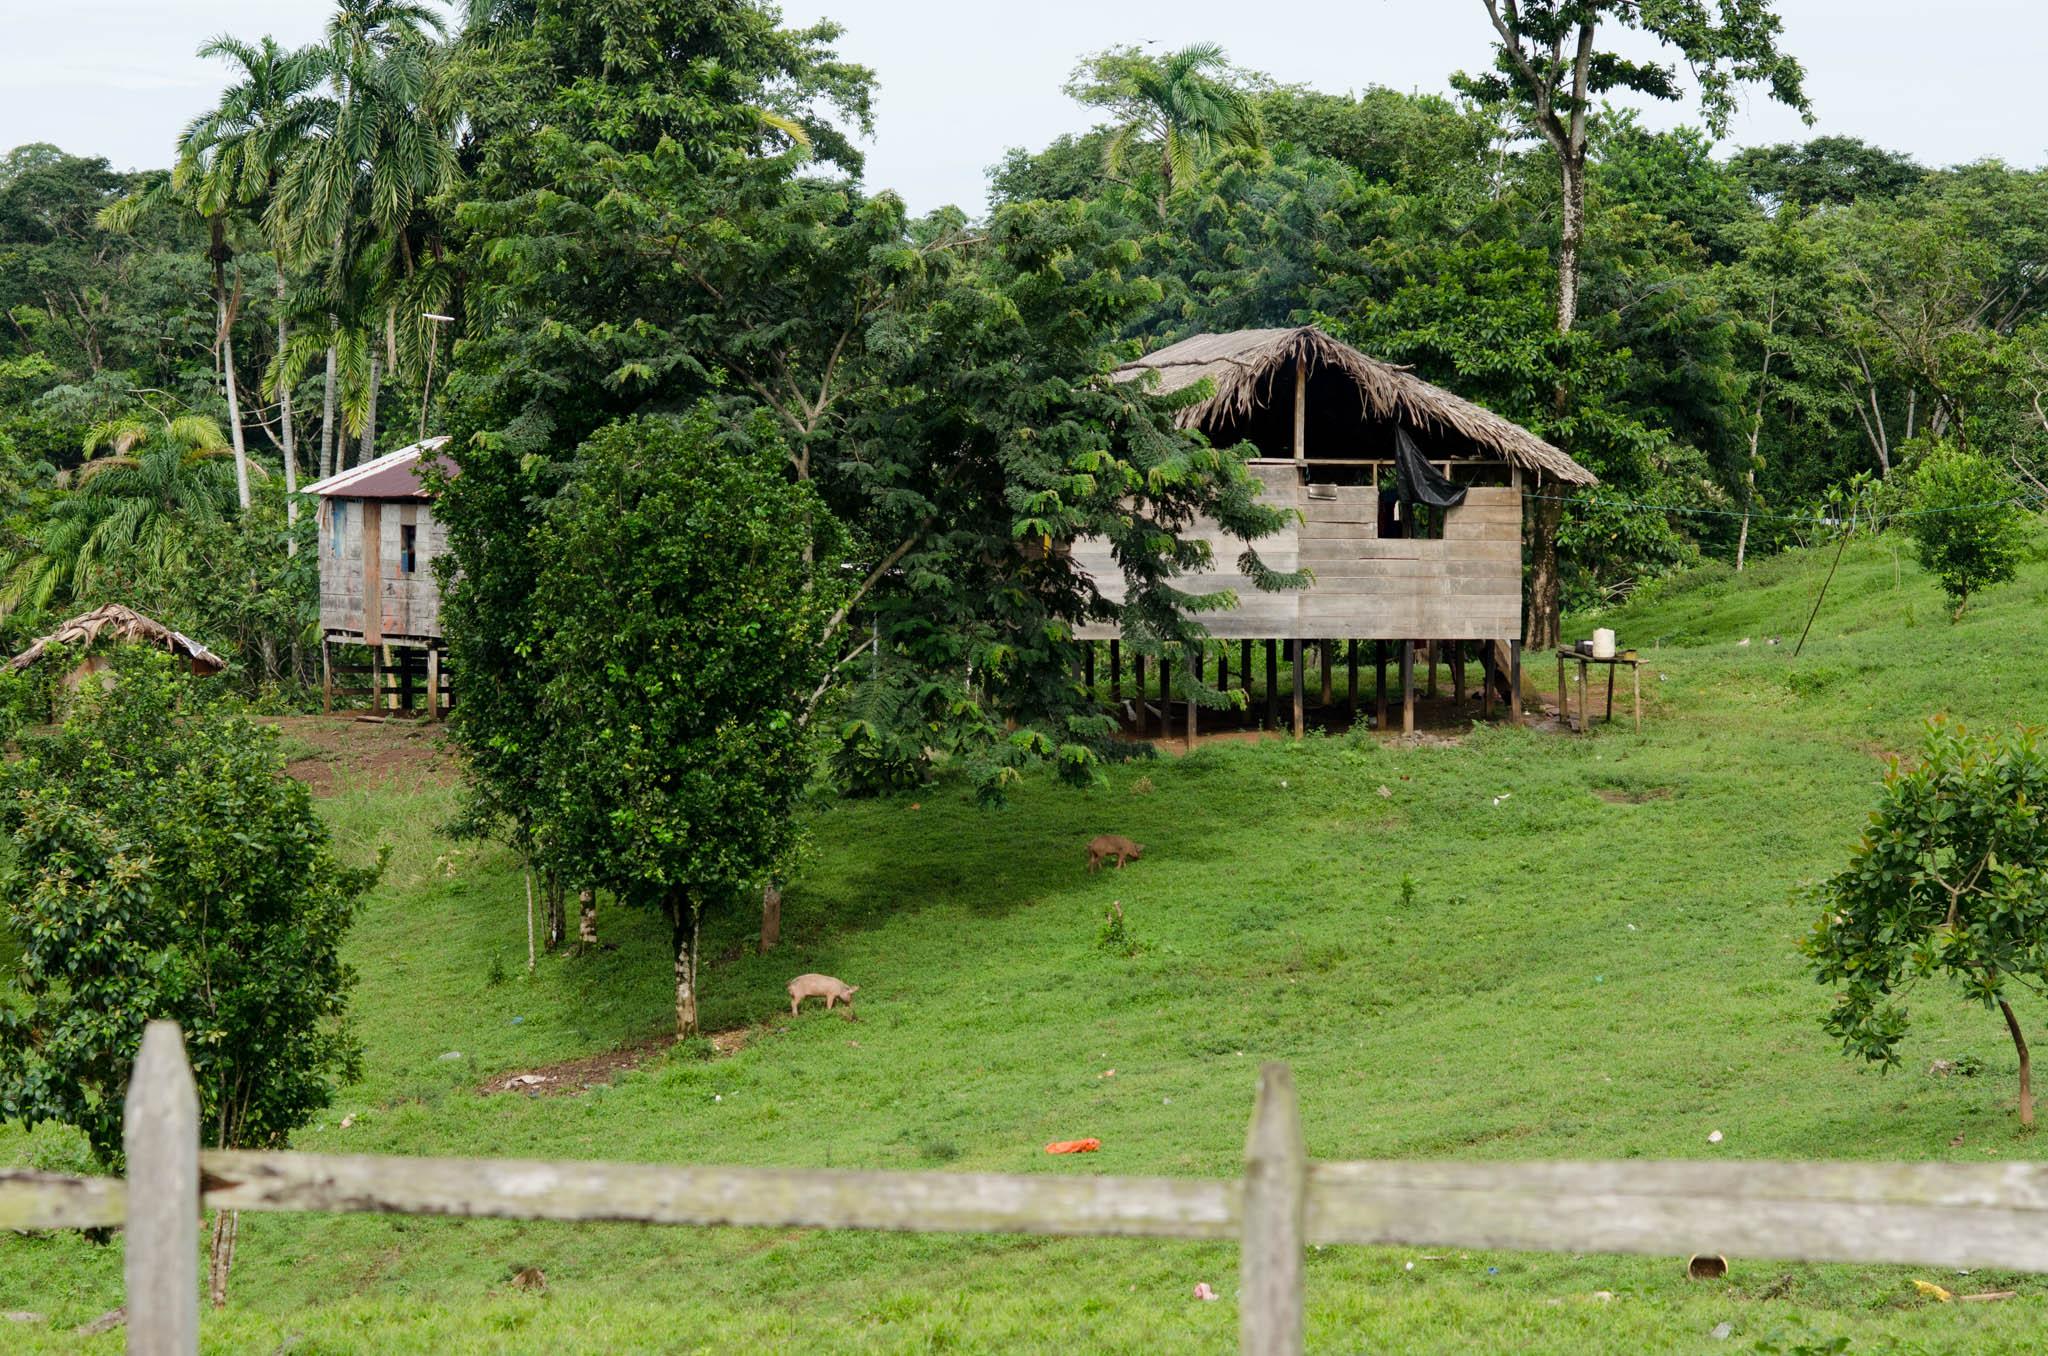 Village Life, Bangkukuk, Nicaragua - photo, Tom Miller